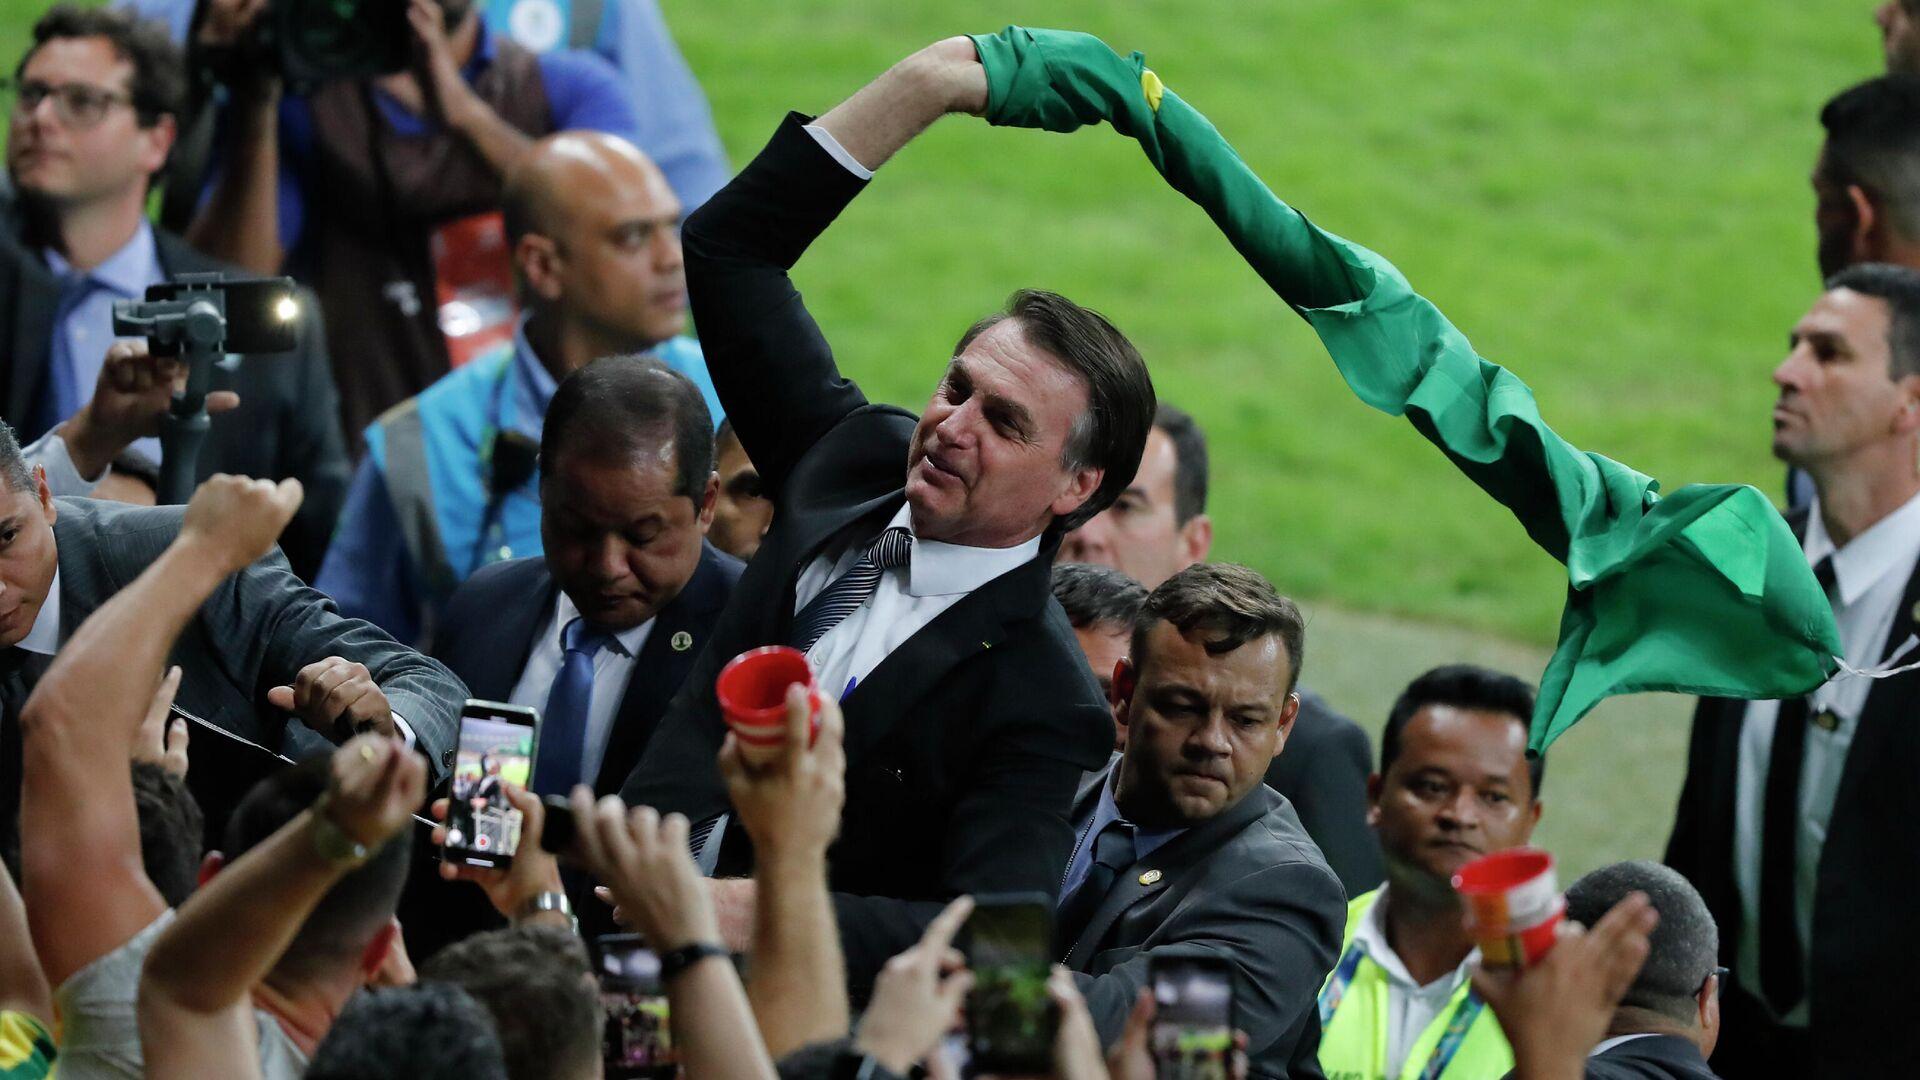 El presidente de Brasil,. Jair Bolsonaro, celebra el título de la Copa América 2019 tras el triunfo de Brasil - Sputnik Mundo, 1920, 07.06.2021